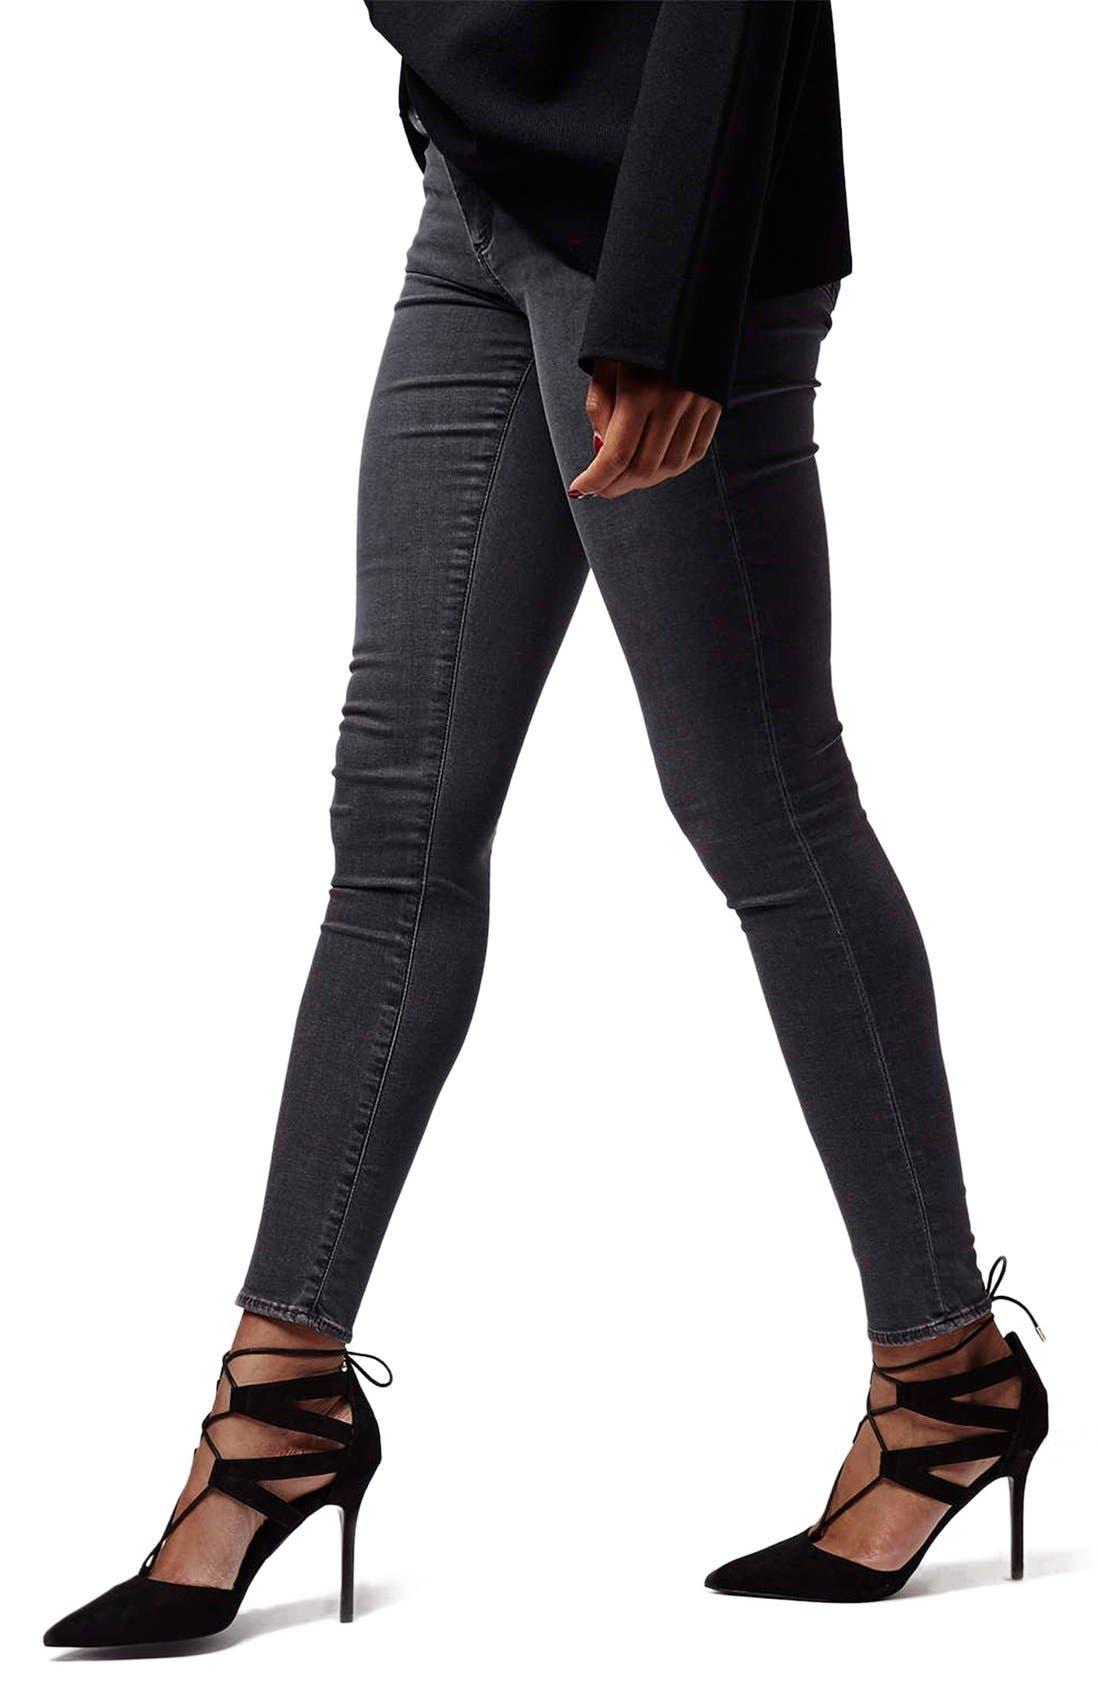 Main Image - Topshop Moto 'Jamie' Skinny Jeans (Tall)